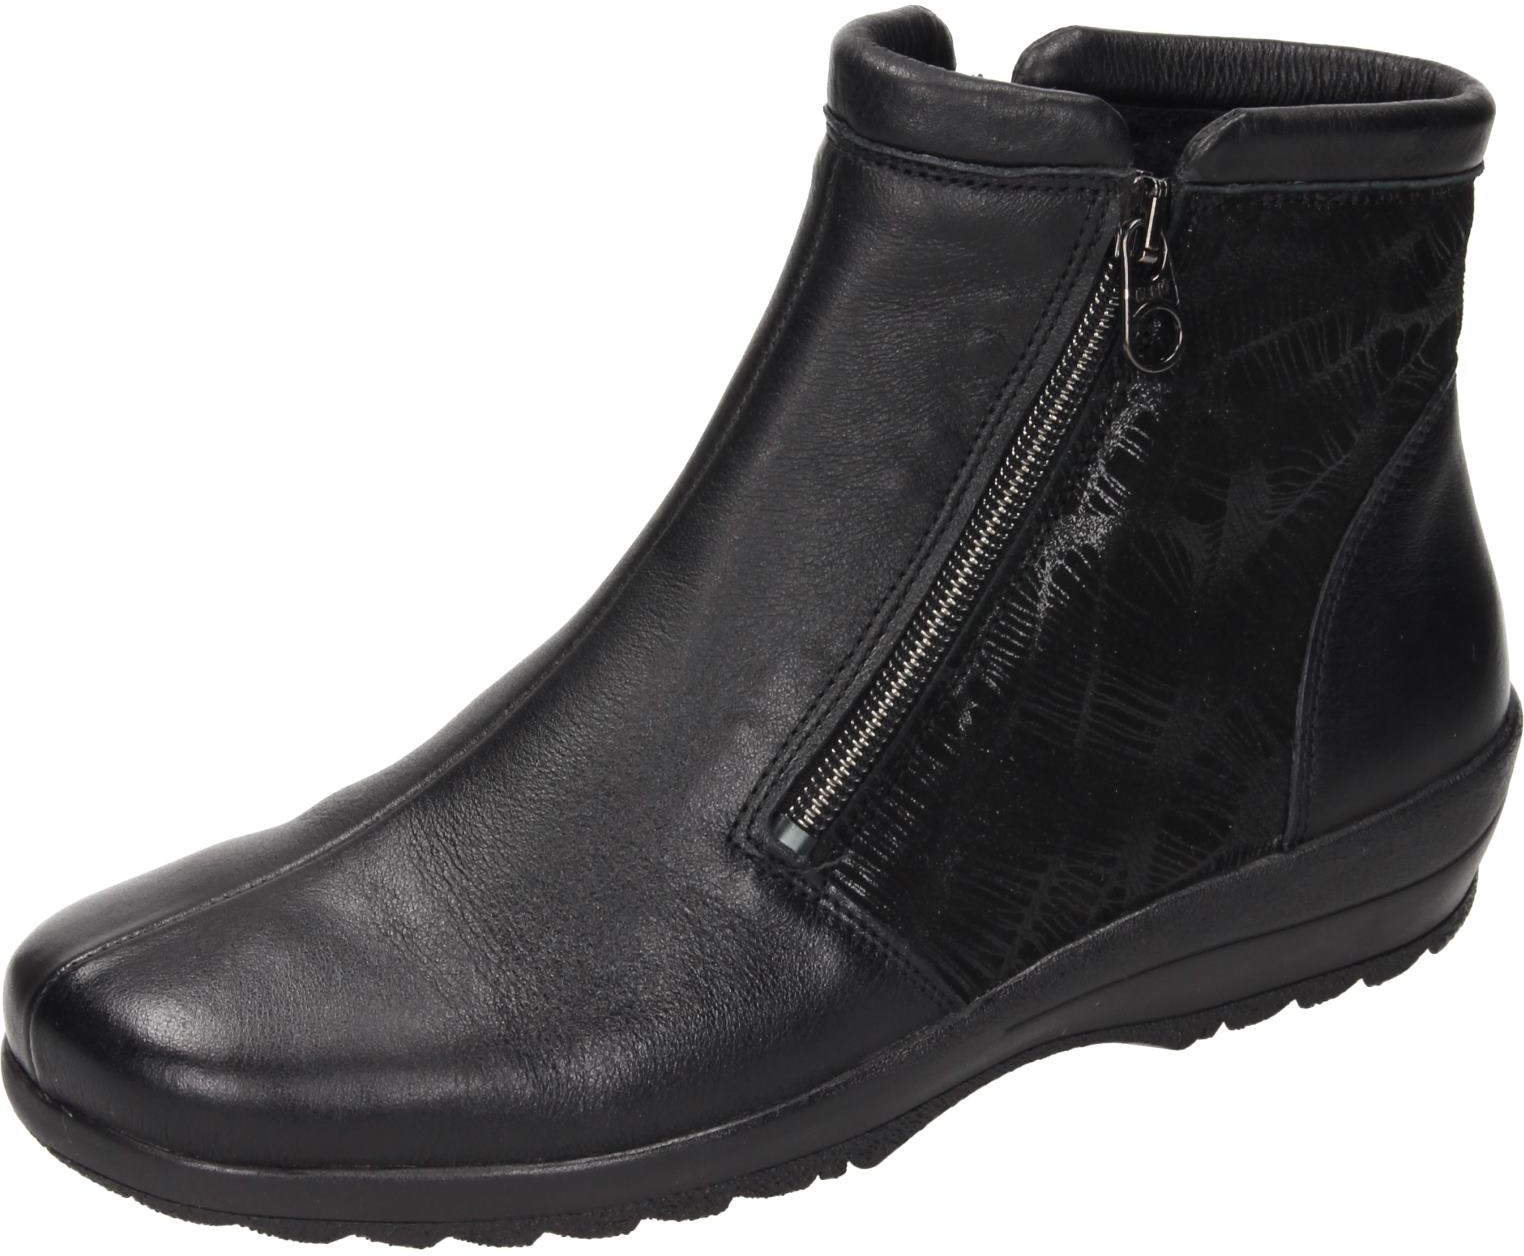 Comfortabel Damen Schuhe Damen-Stiefelette Damen-Stiefelette Schuhe - K schwarz Leder 991213 be8926